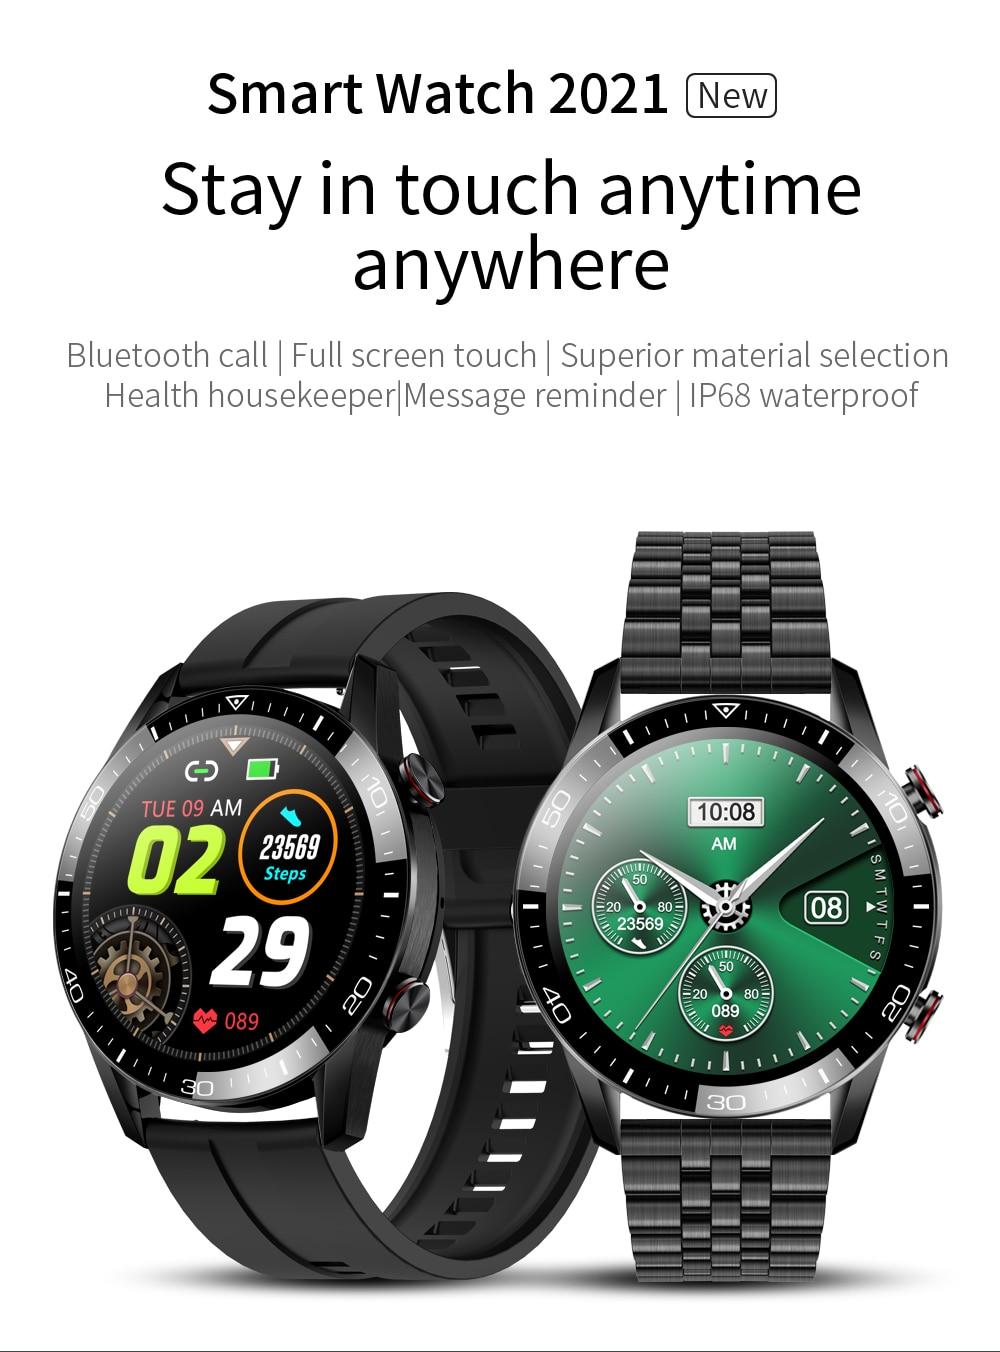 H1351d19cf7114580b28b0092ac58ef1ba New Smart Watch Men Bluetooth Call TK2-8 IP68 Waterproof Heart Rate Blood Pressure SmartWatch Fitness Tracker Sports Android IOS